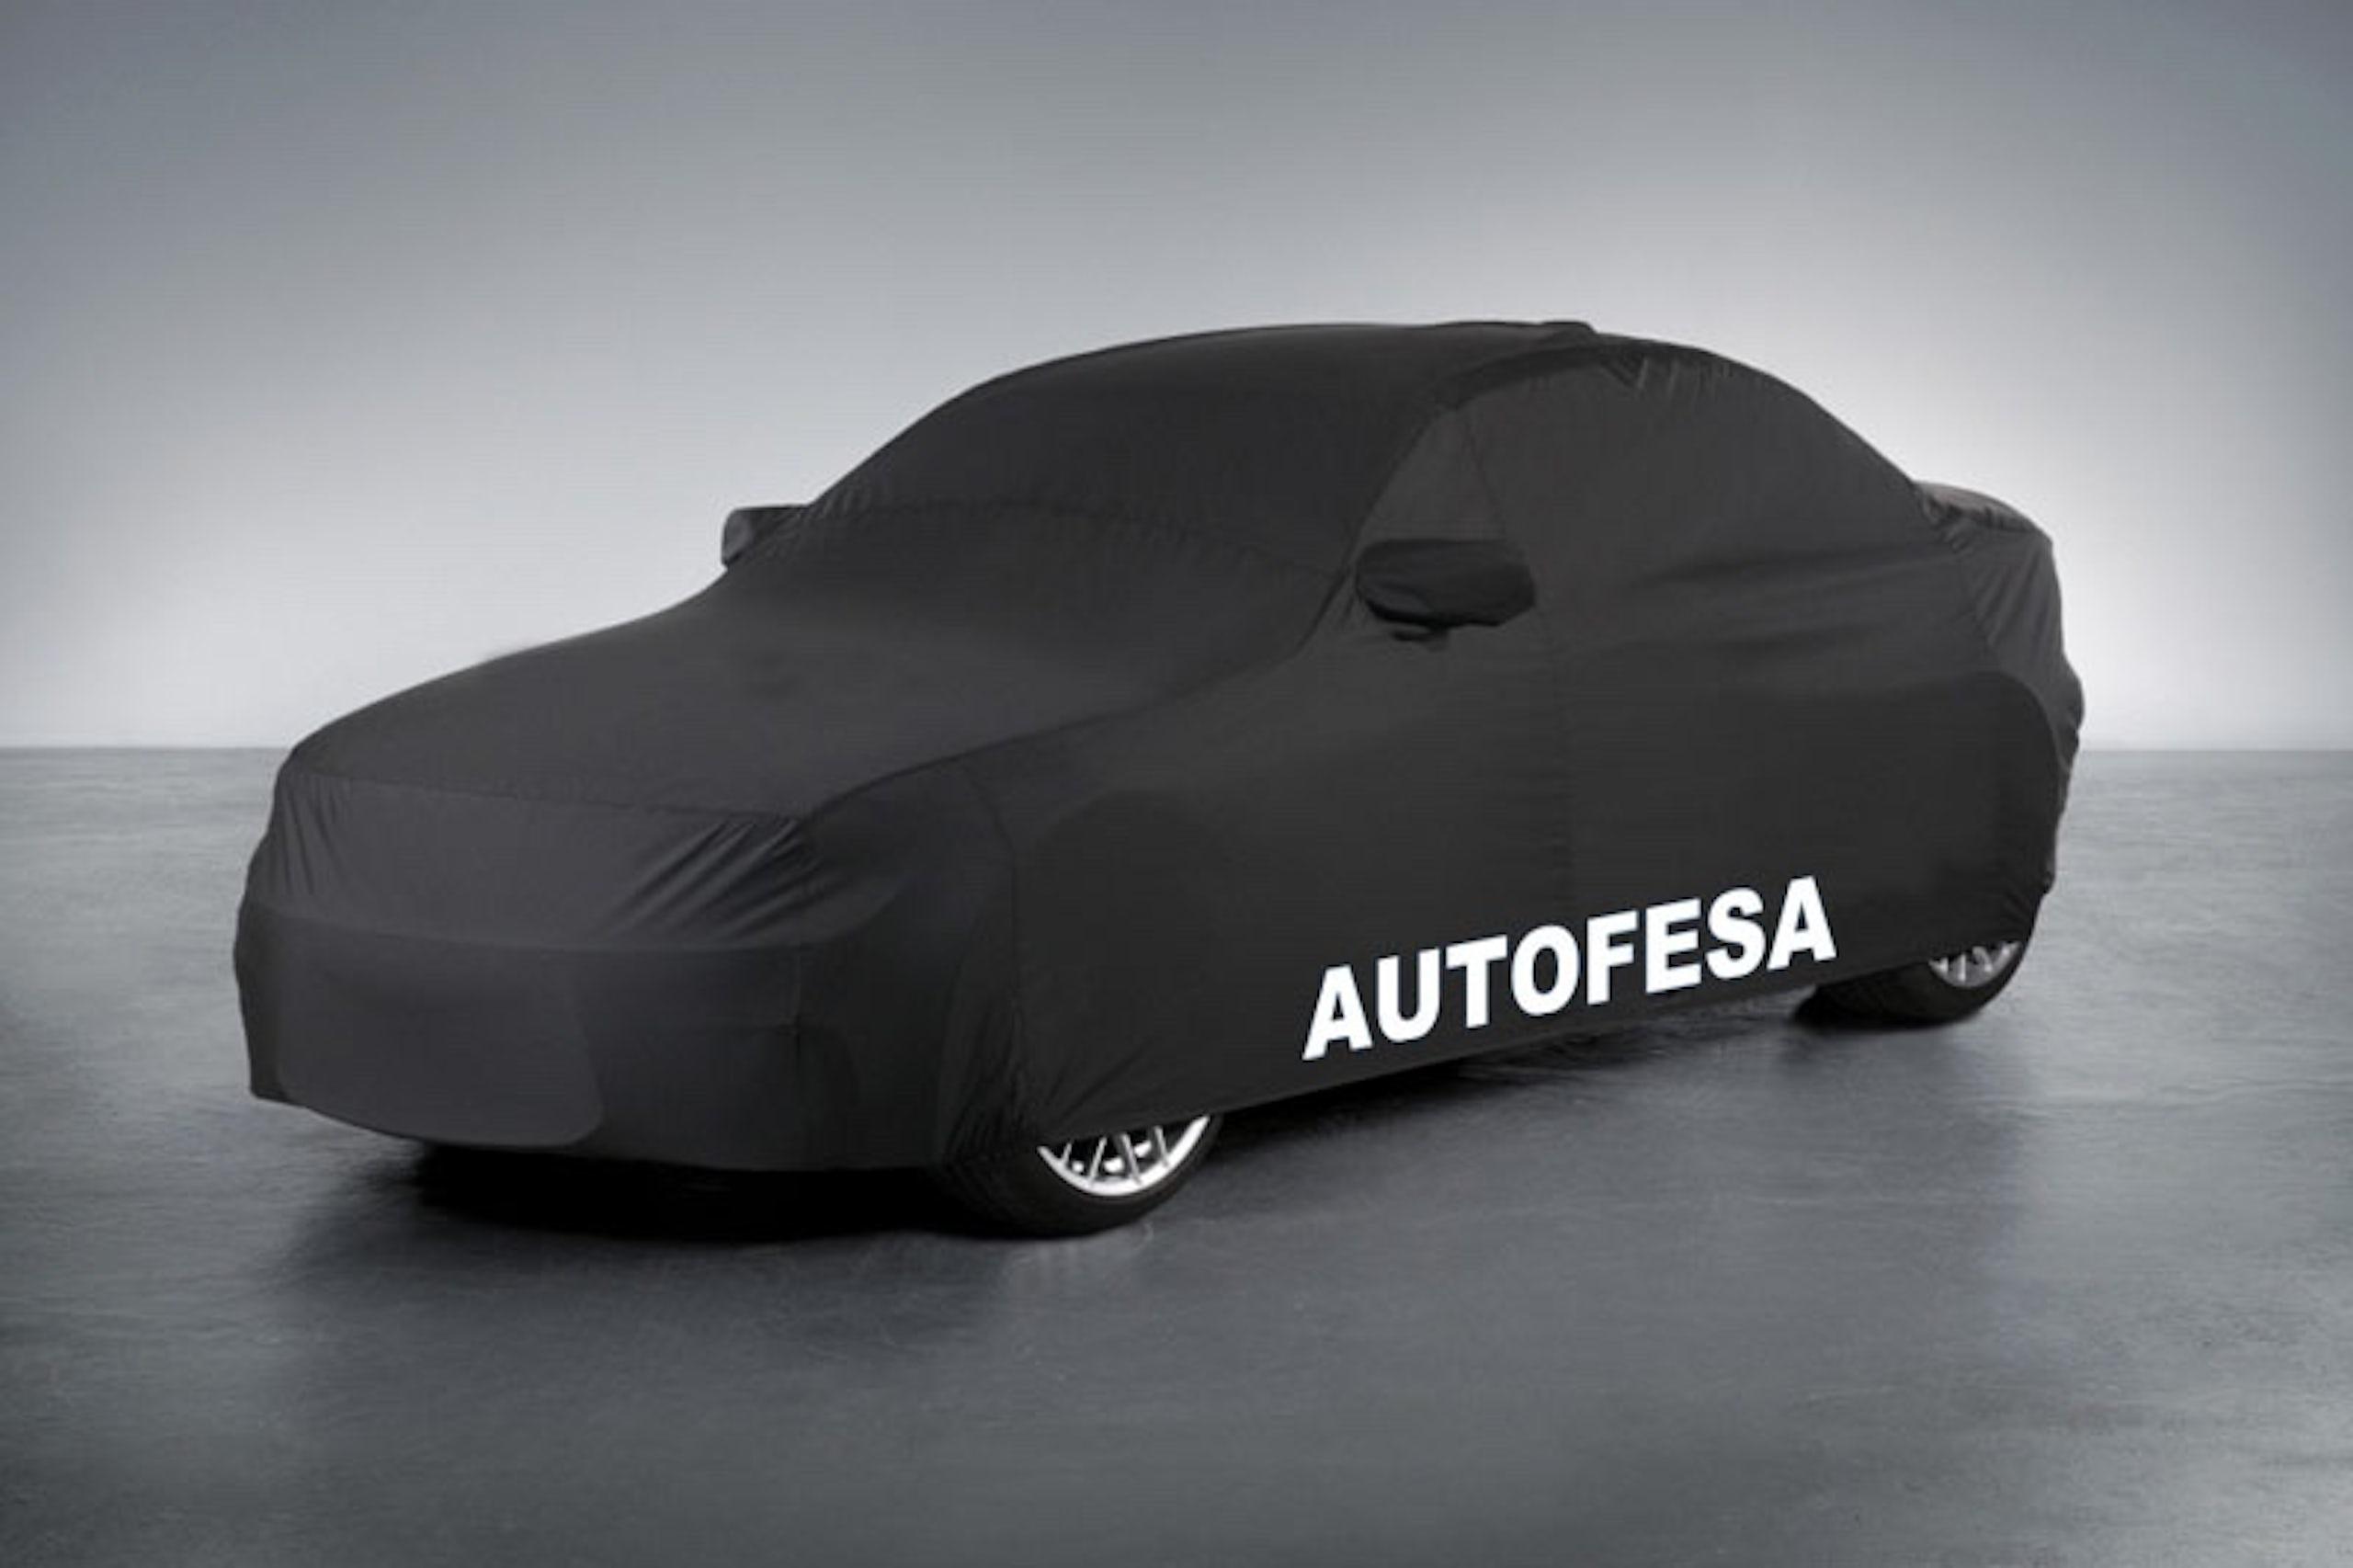 Audi A6 A6Avant COMPETITION ABT 3.0 TDI V6 T 326cv quattro 5p S tronic 4x4 Cpmpetition ABT S/S - Foto 7